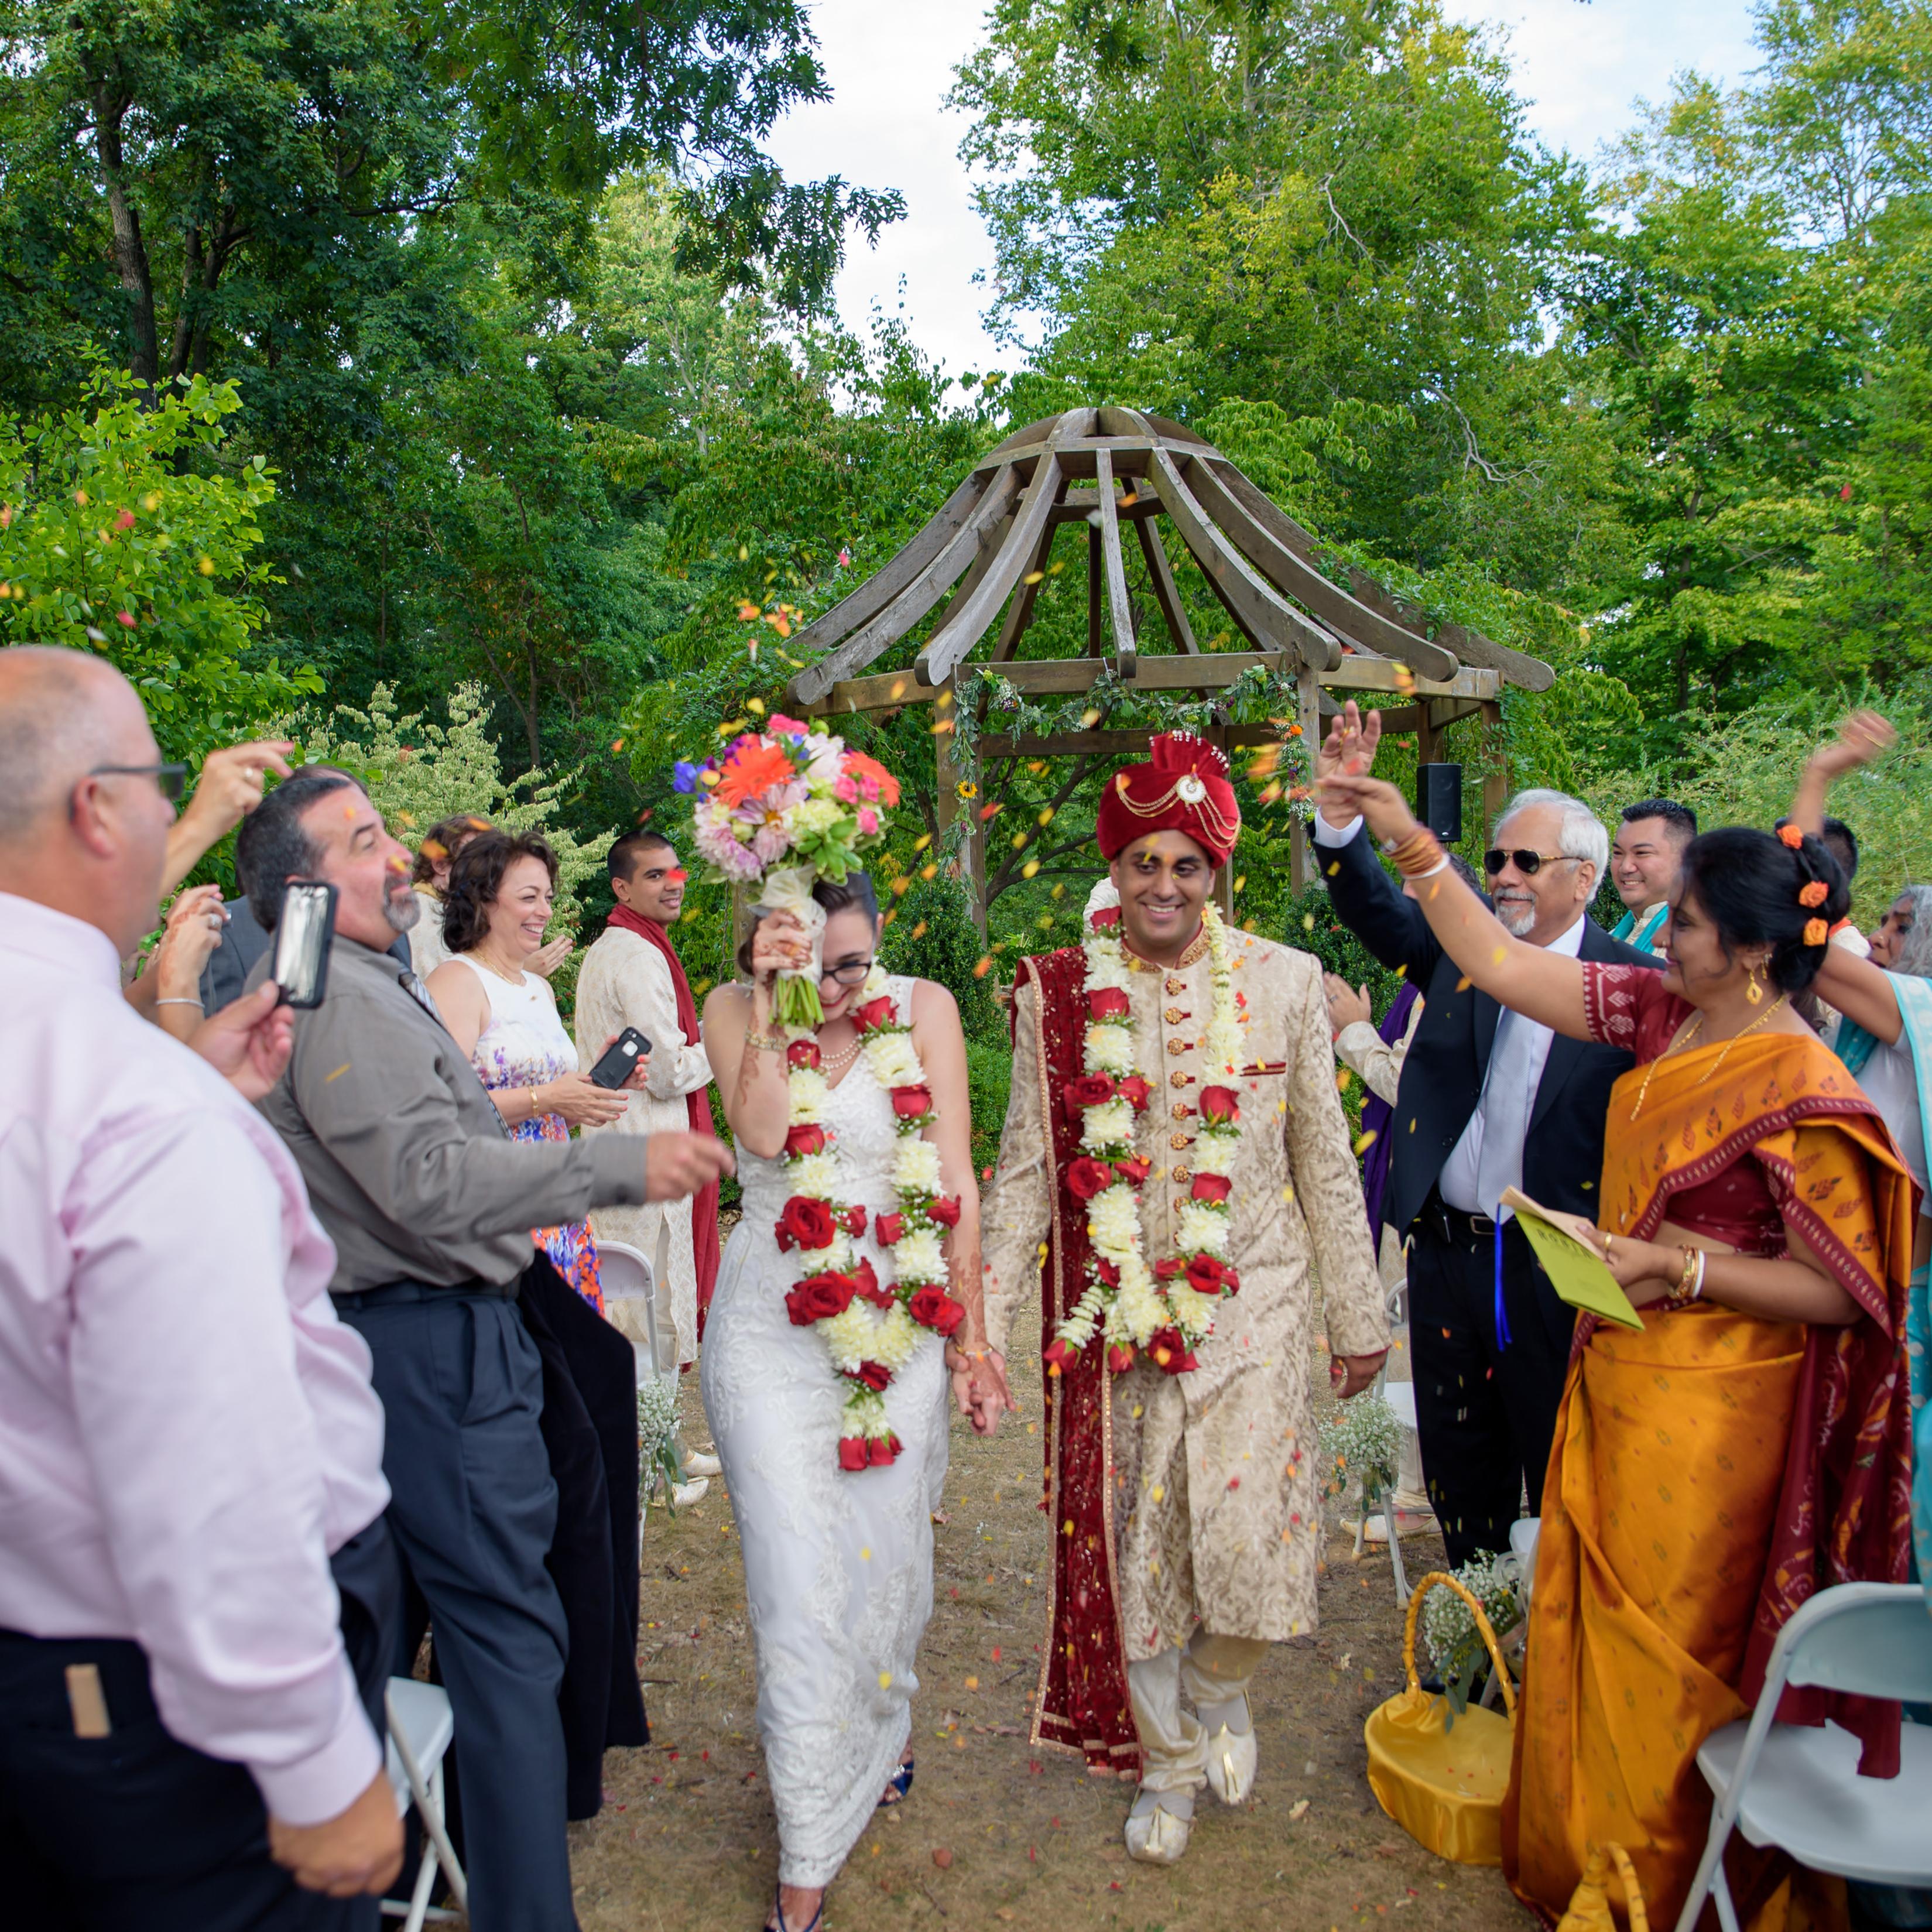 Garden Wedding Ceremony: Wedding Ceremonies And Receptions